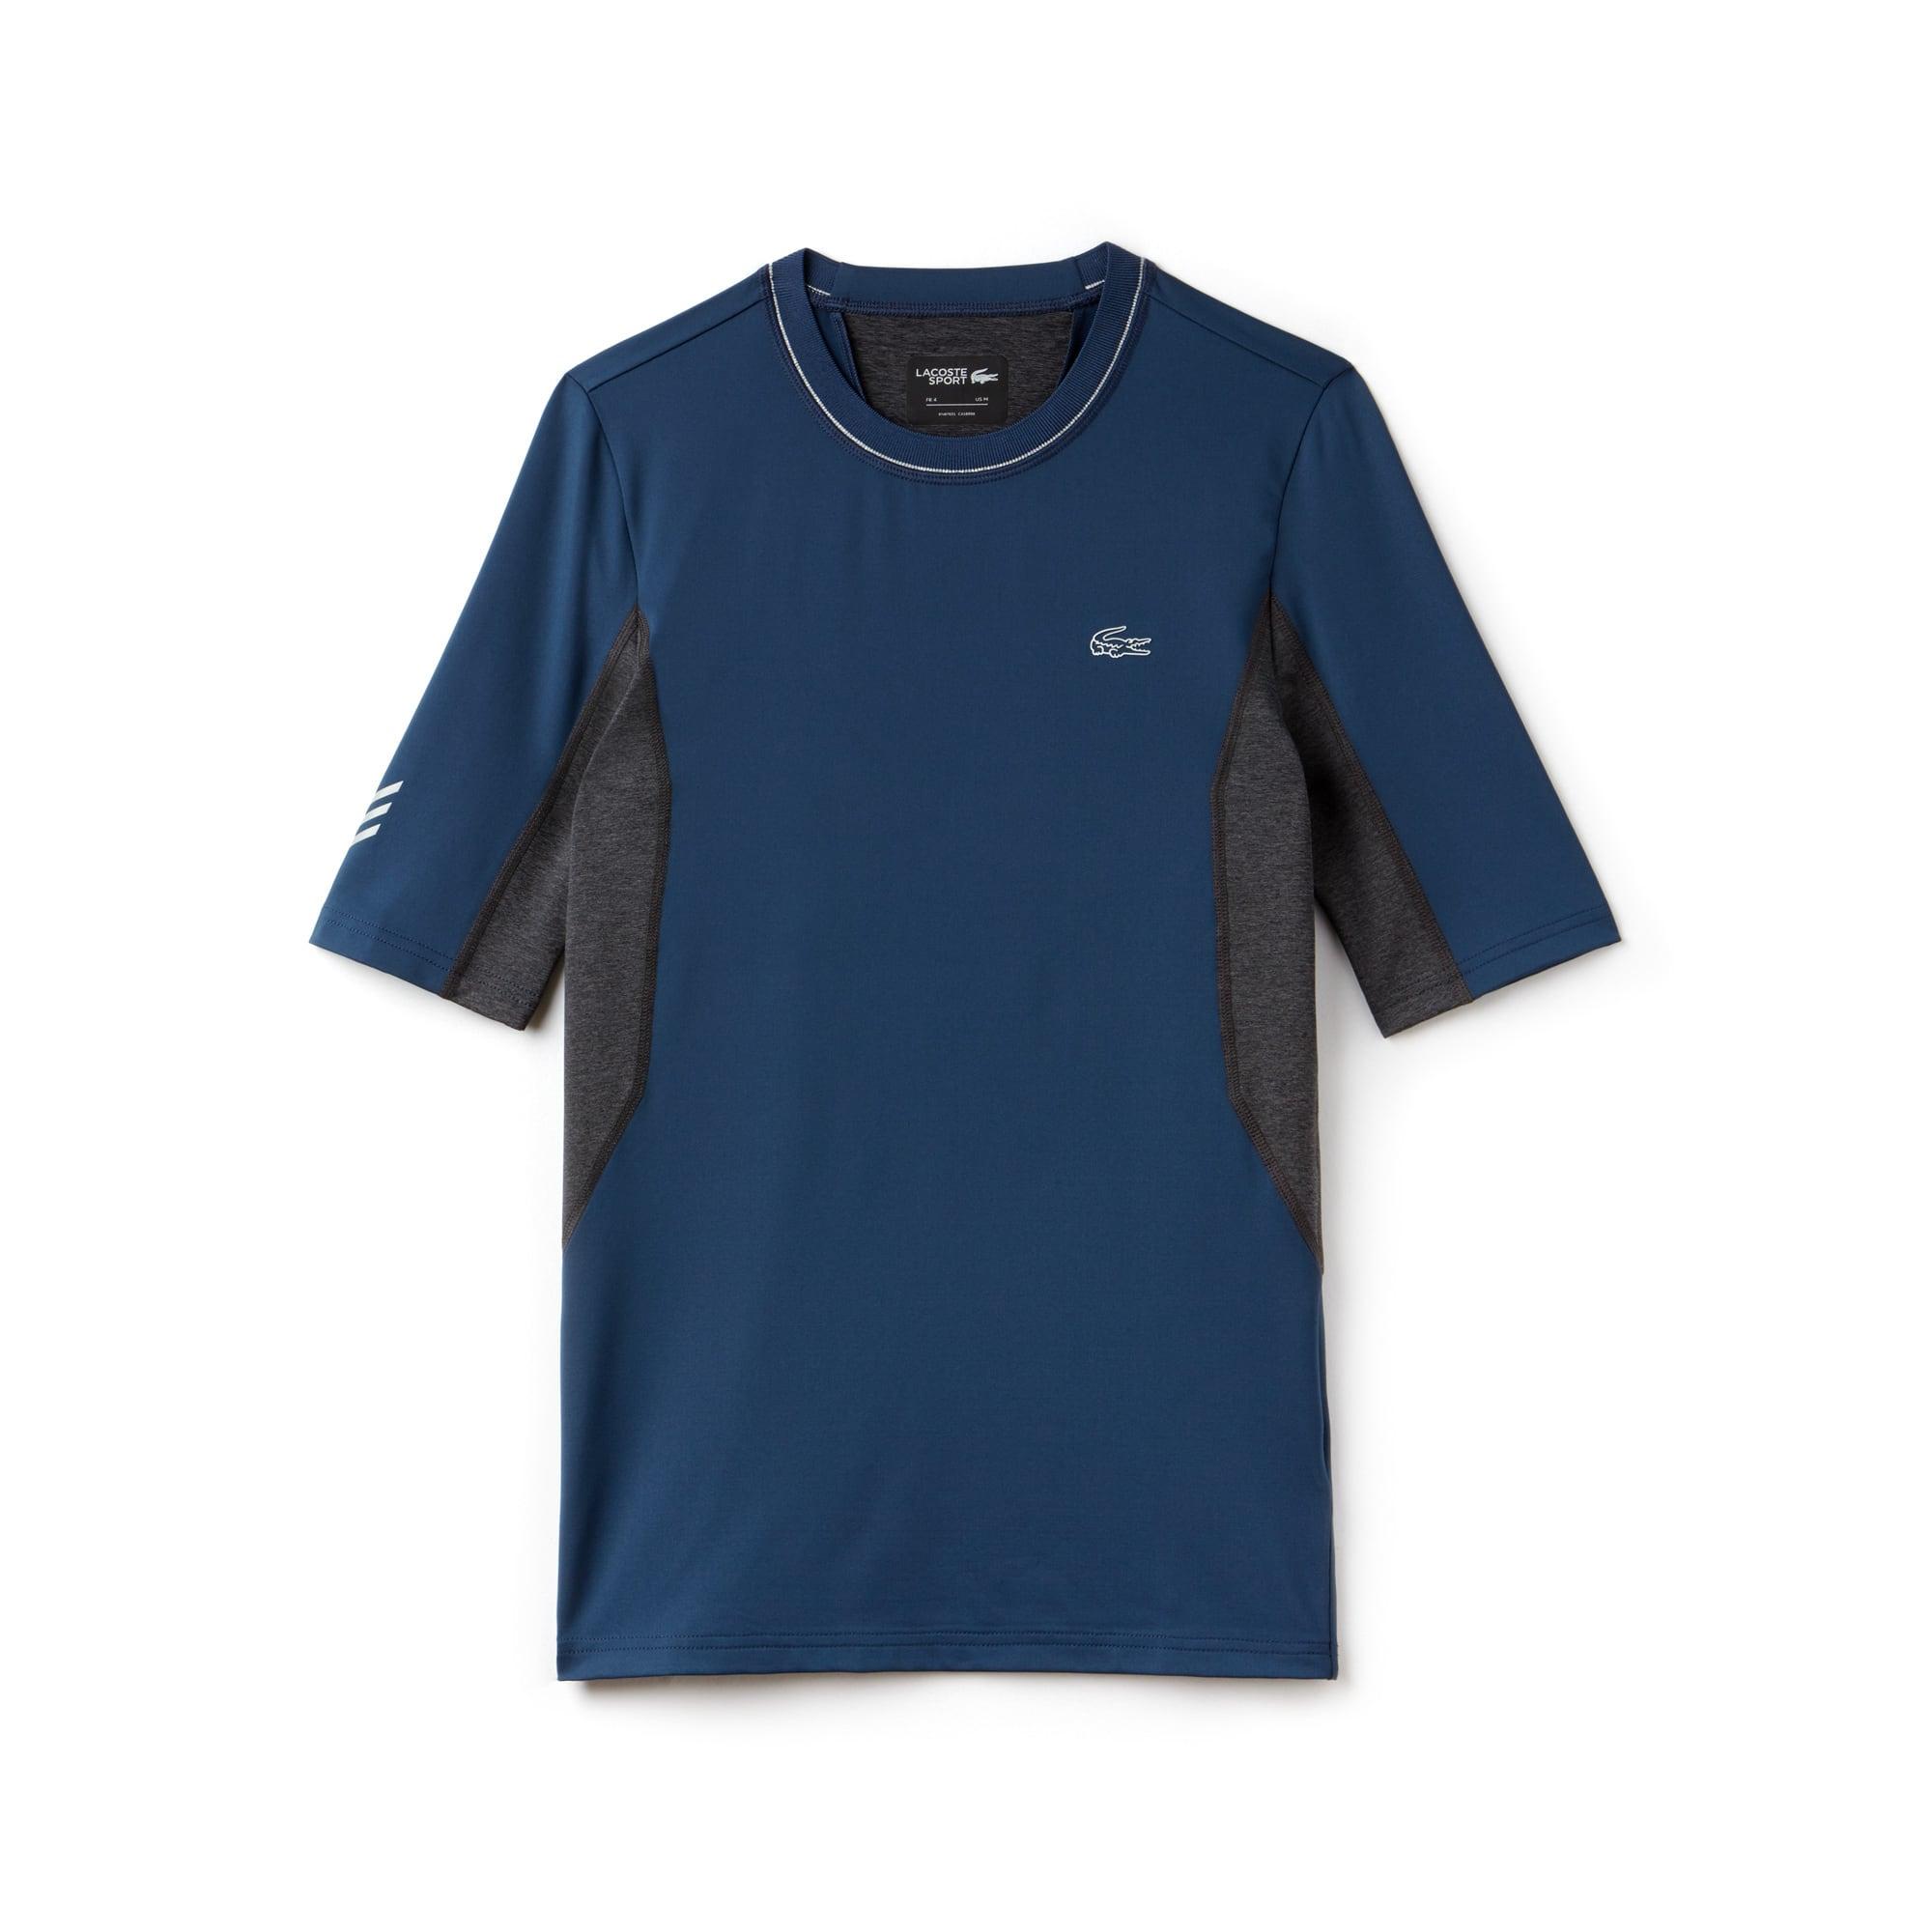 Men's Lacoste SPORT Technical Jersey Compression Tennis T-shirt